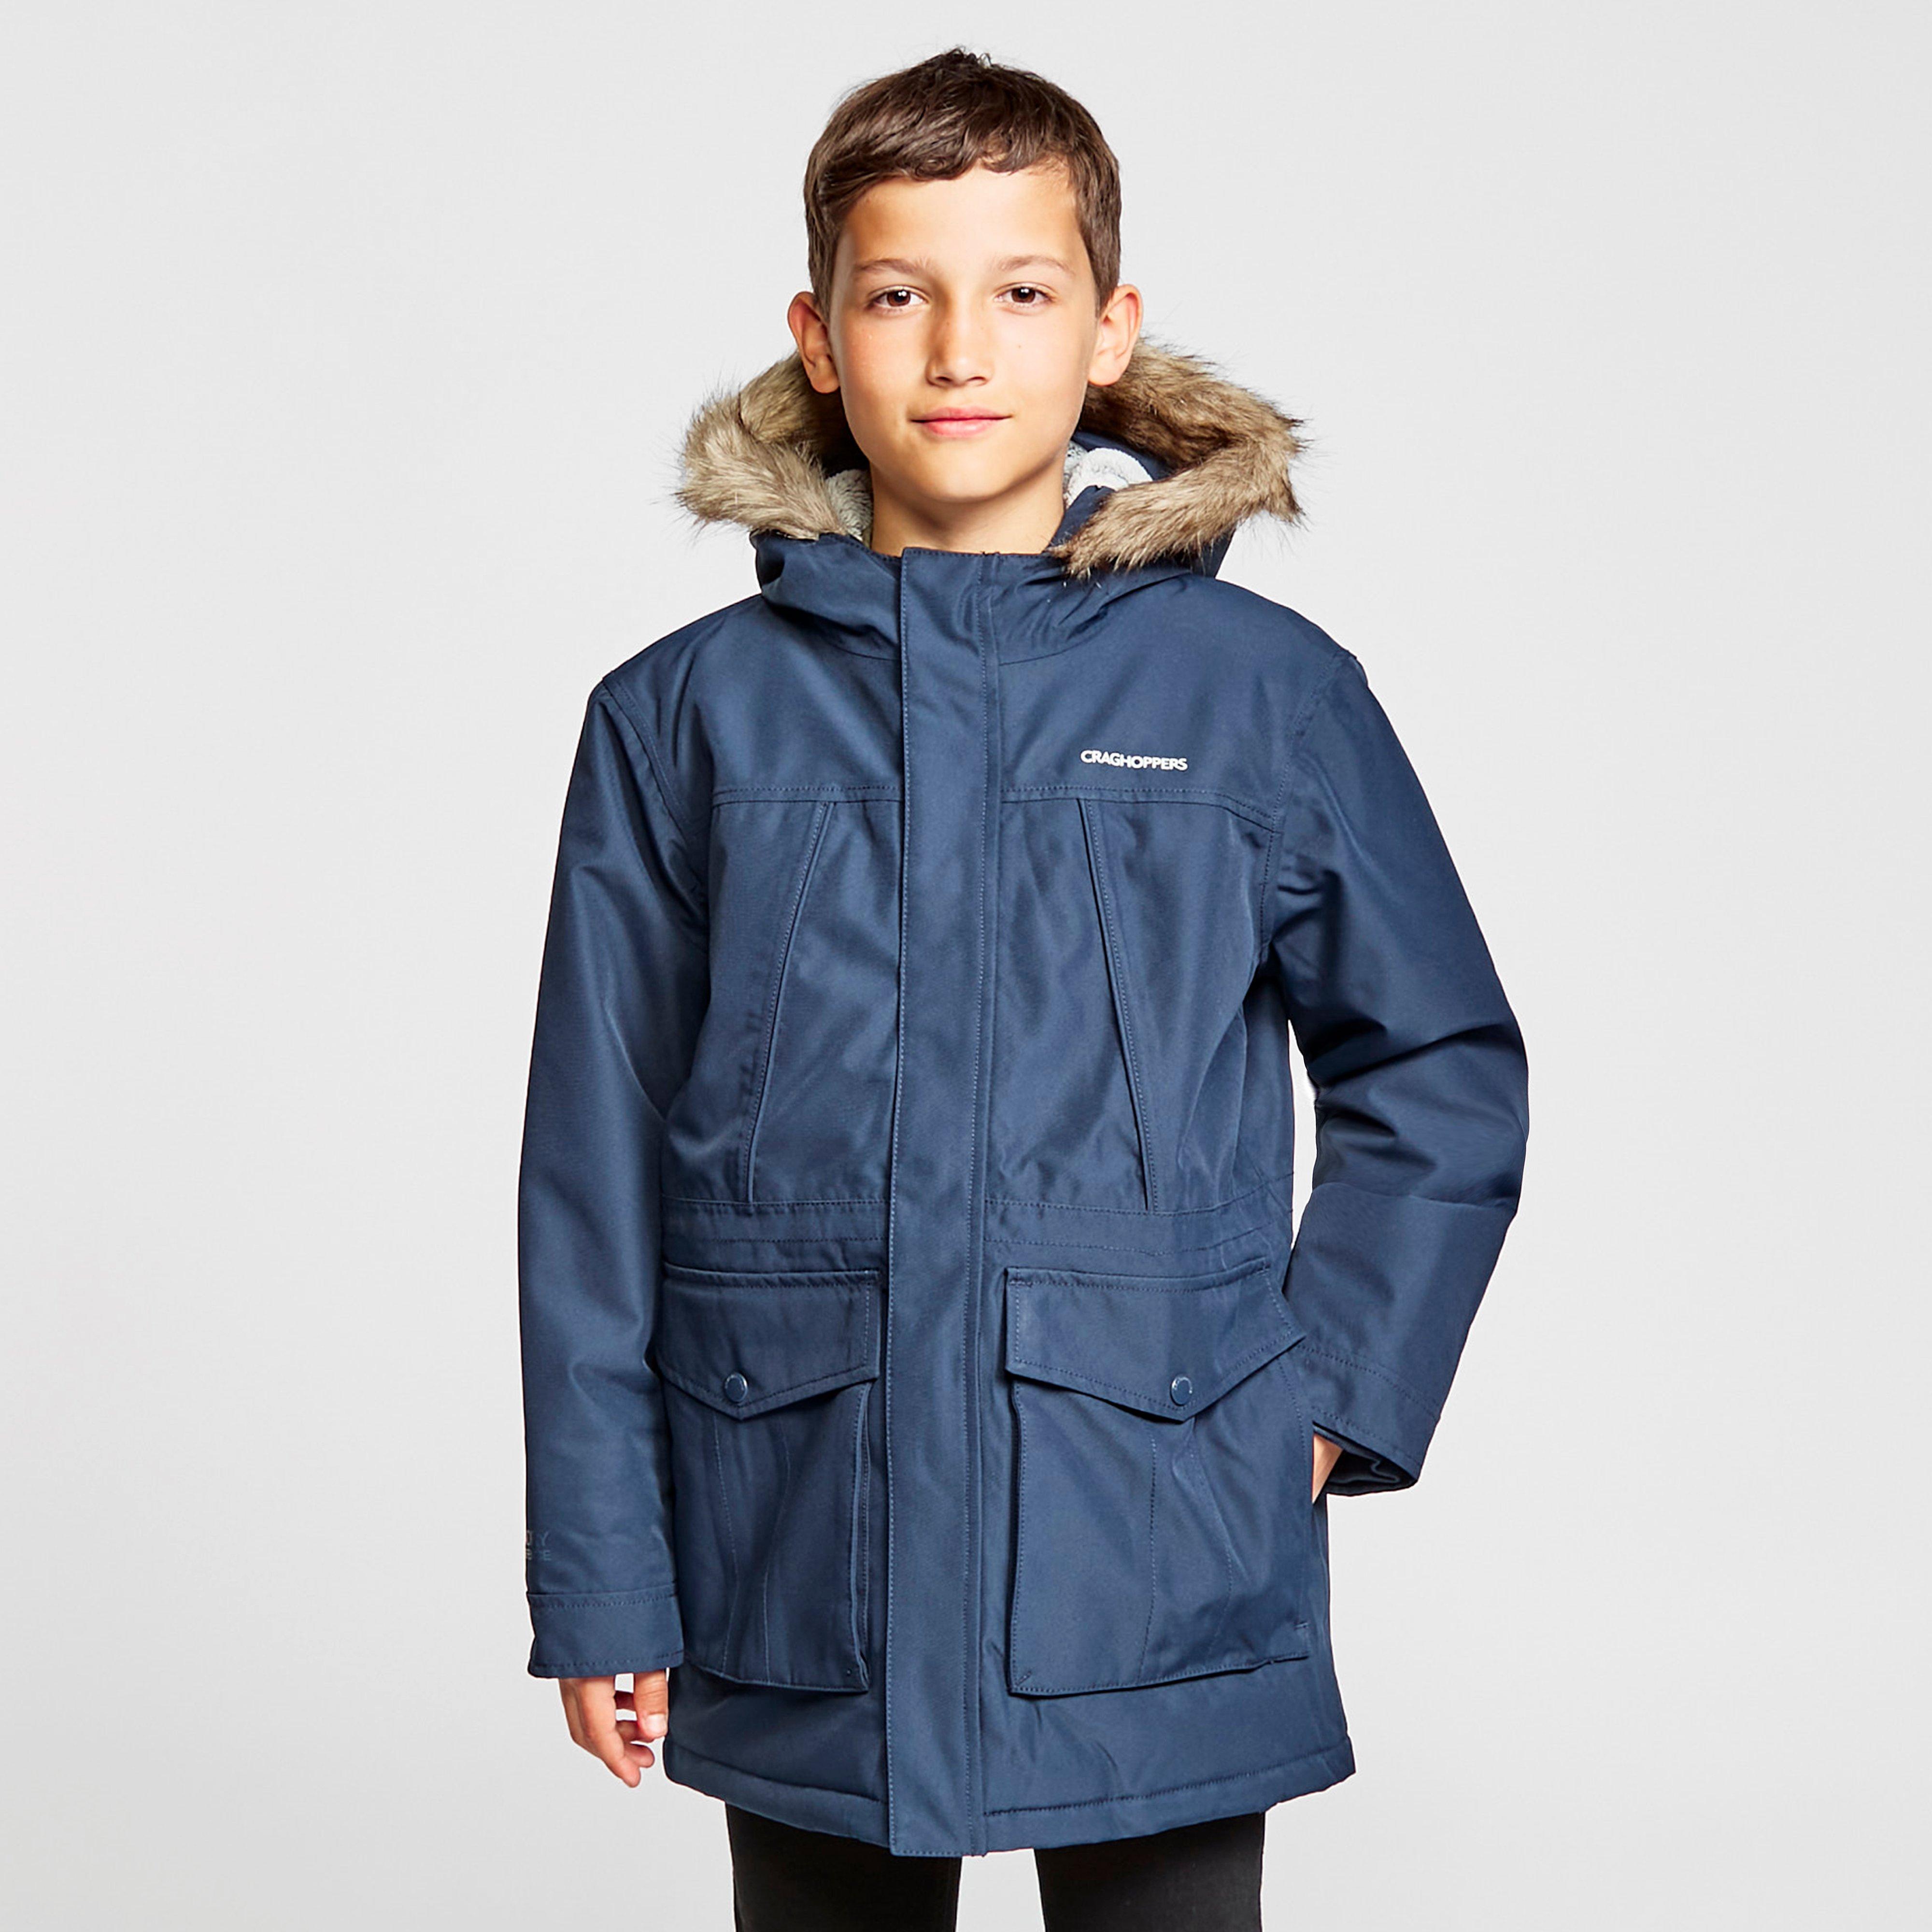 Craghoppers Kids Marikio Jacket - Navy/navy  Navy/navy